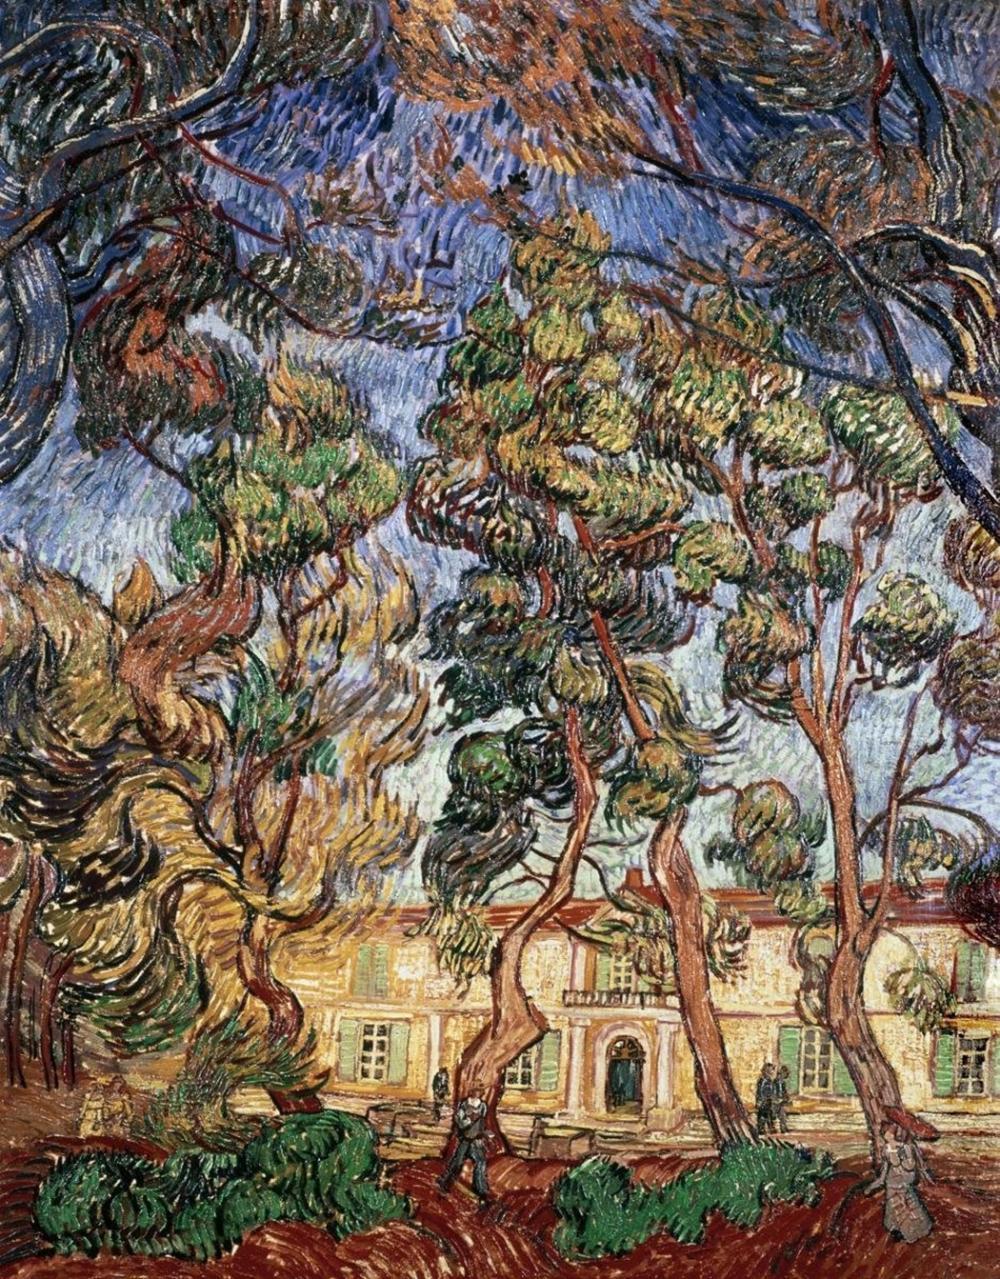 VINCENT VAN GOGH - TREES IN THE GARDEN OF SAINT-PAUL HOSPITAL